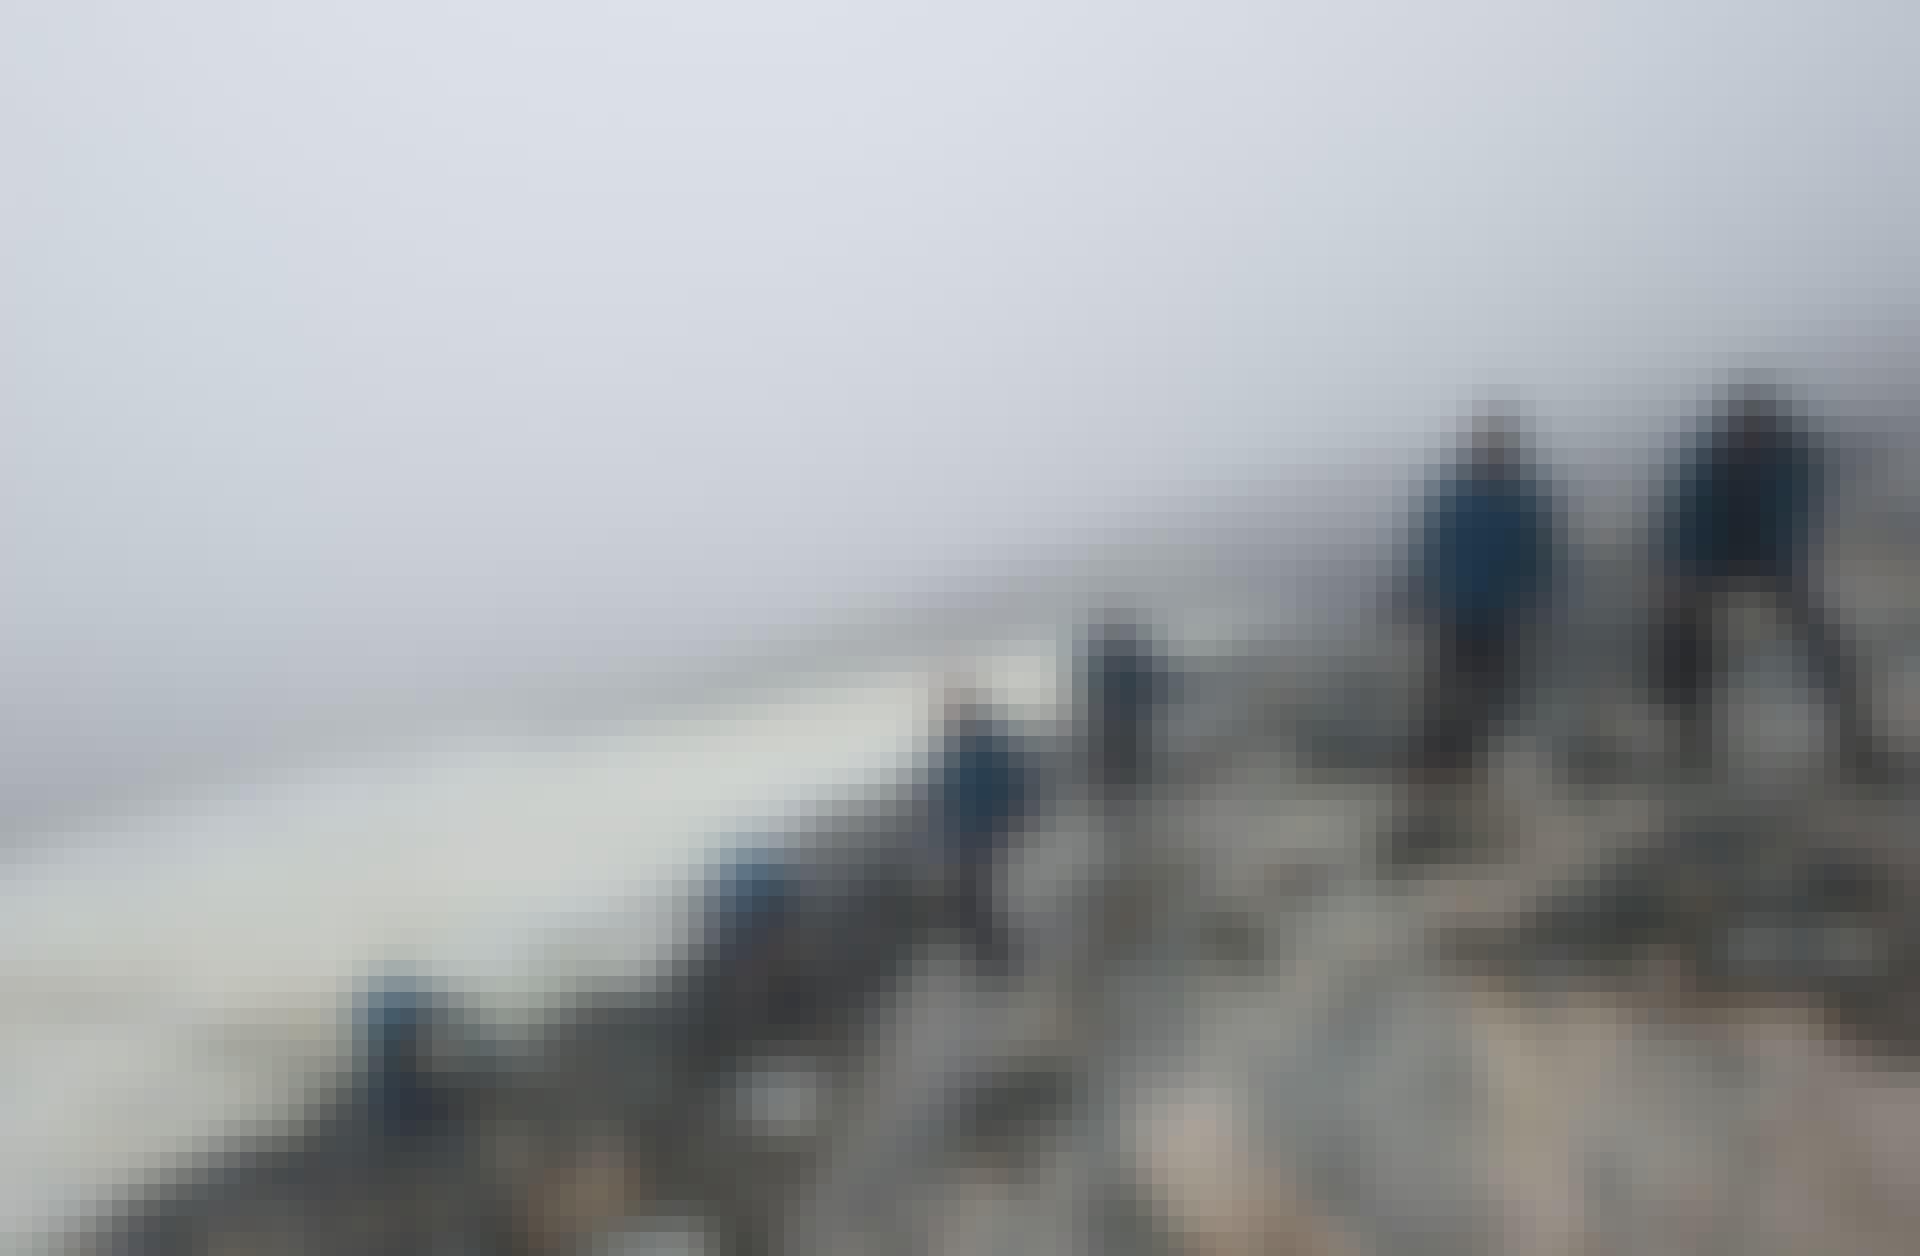 Hvert år i august og september måned kulegraver arkæologer de norske bjergtoppe i Oppland.